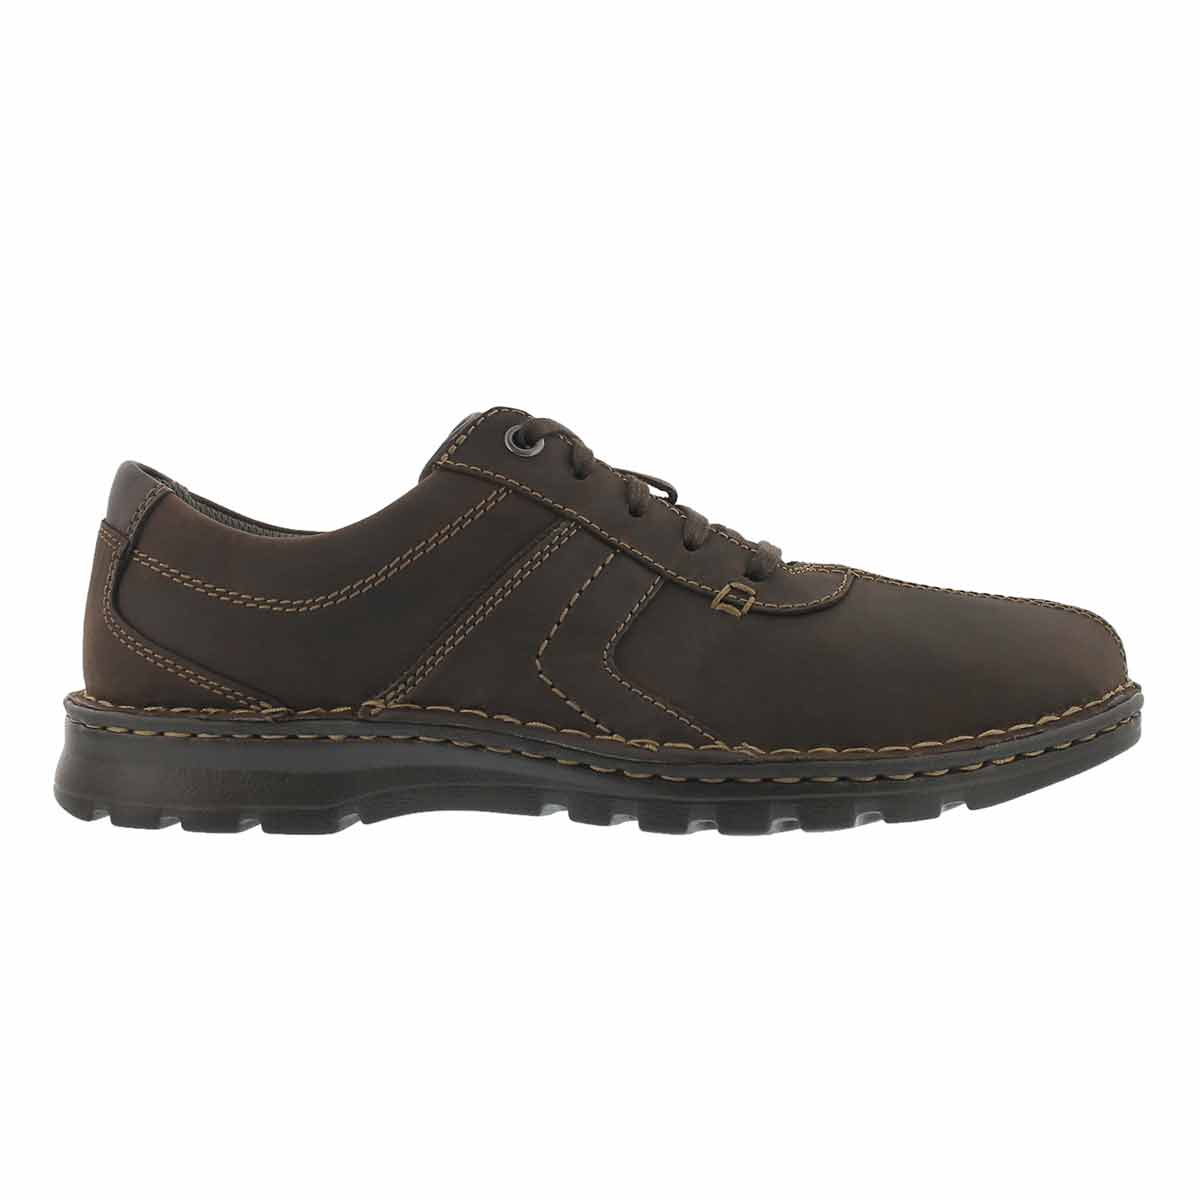 Men's VANEK WALK dark brown casual oxfords